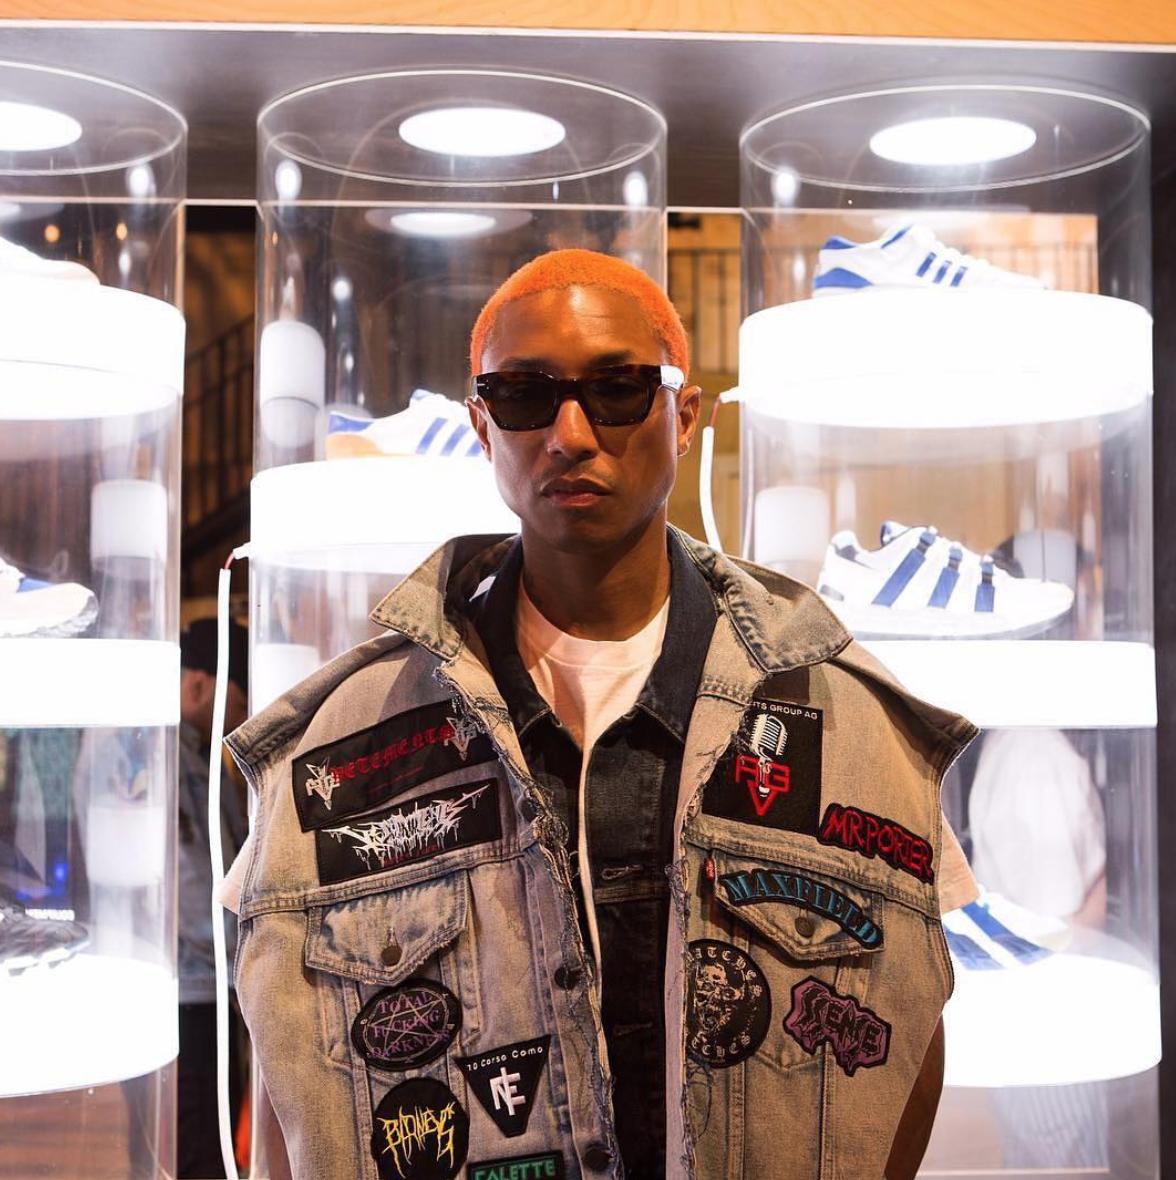 SPOTTED: Pharrell Williams In Vetements x Levi's Denim Waistcoat And Celine Sunglasses